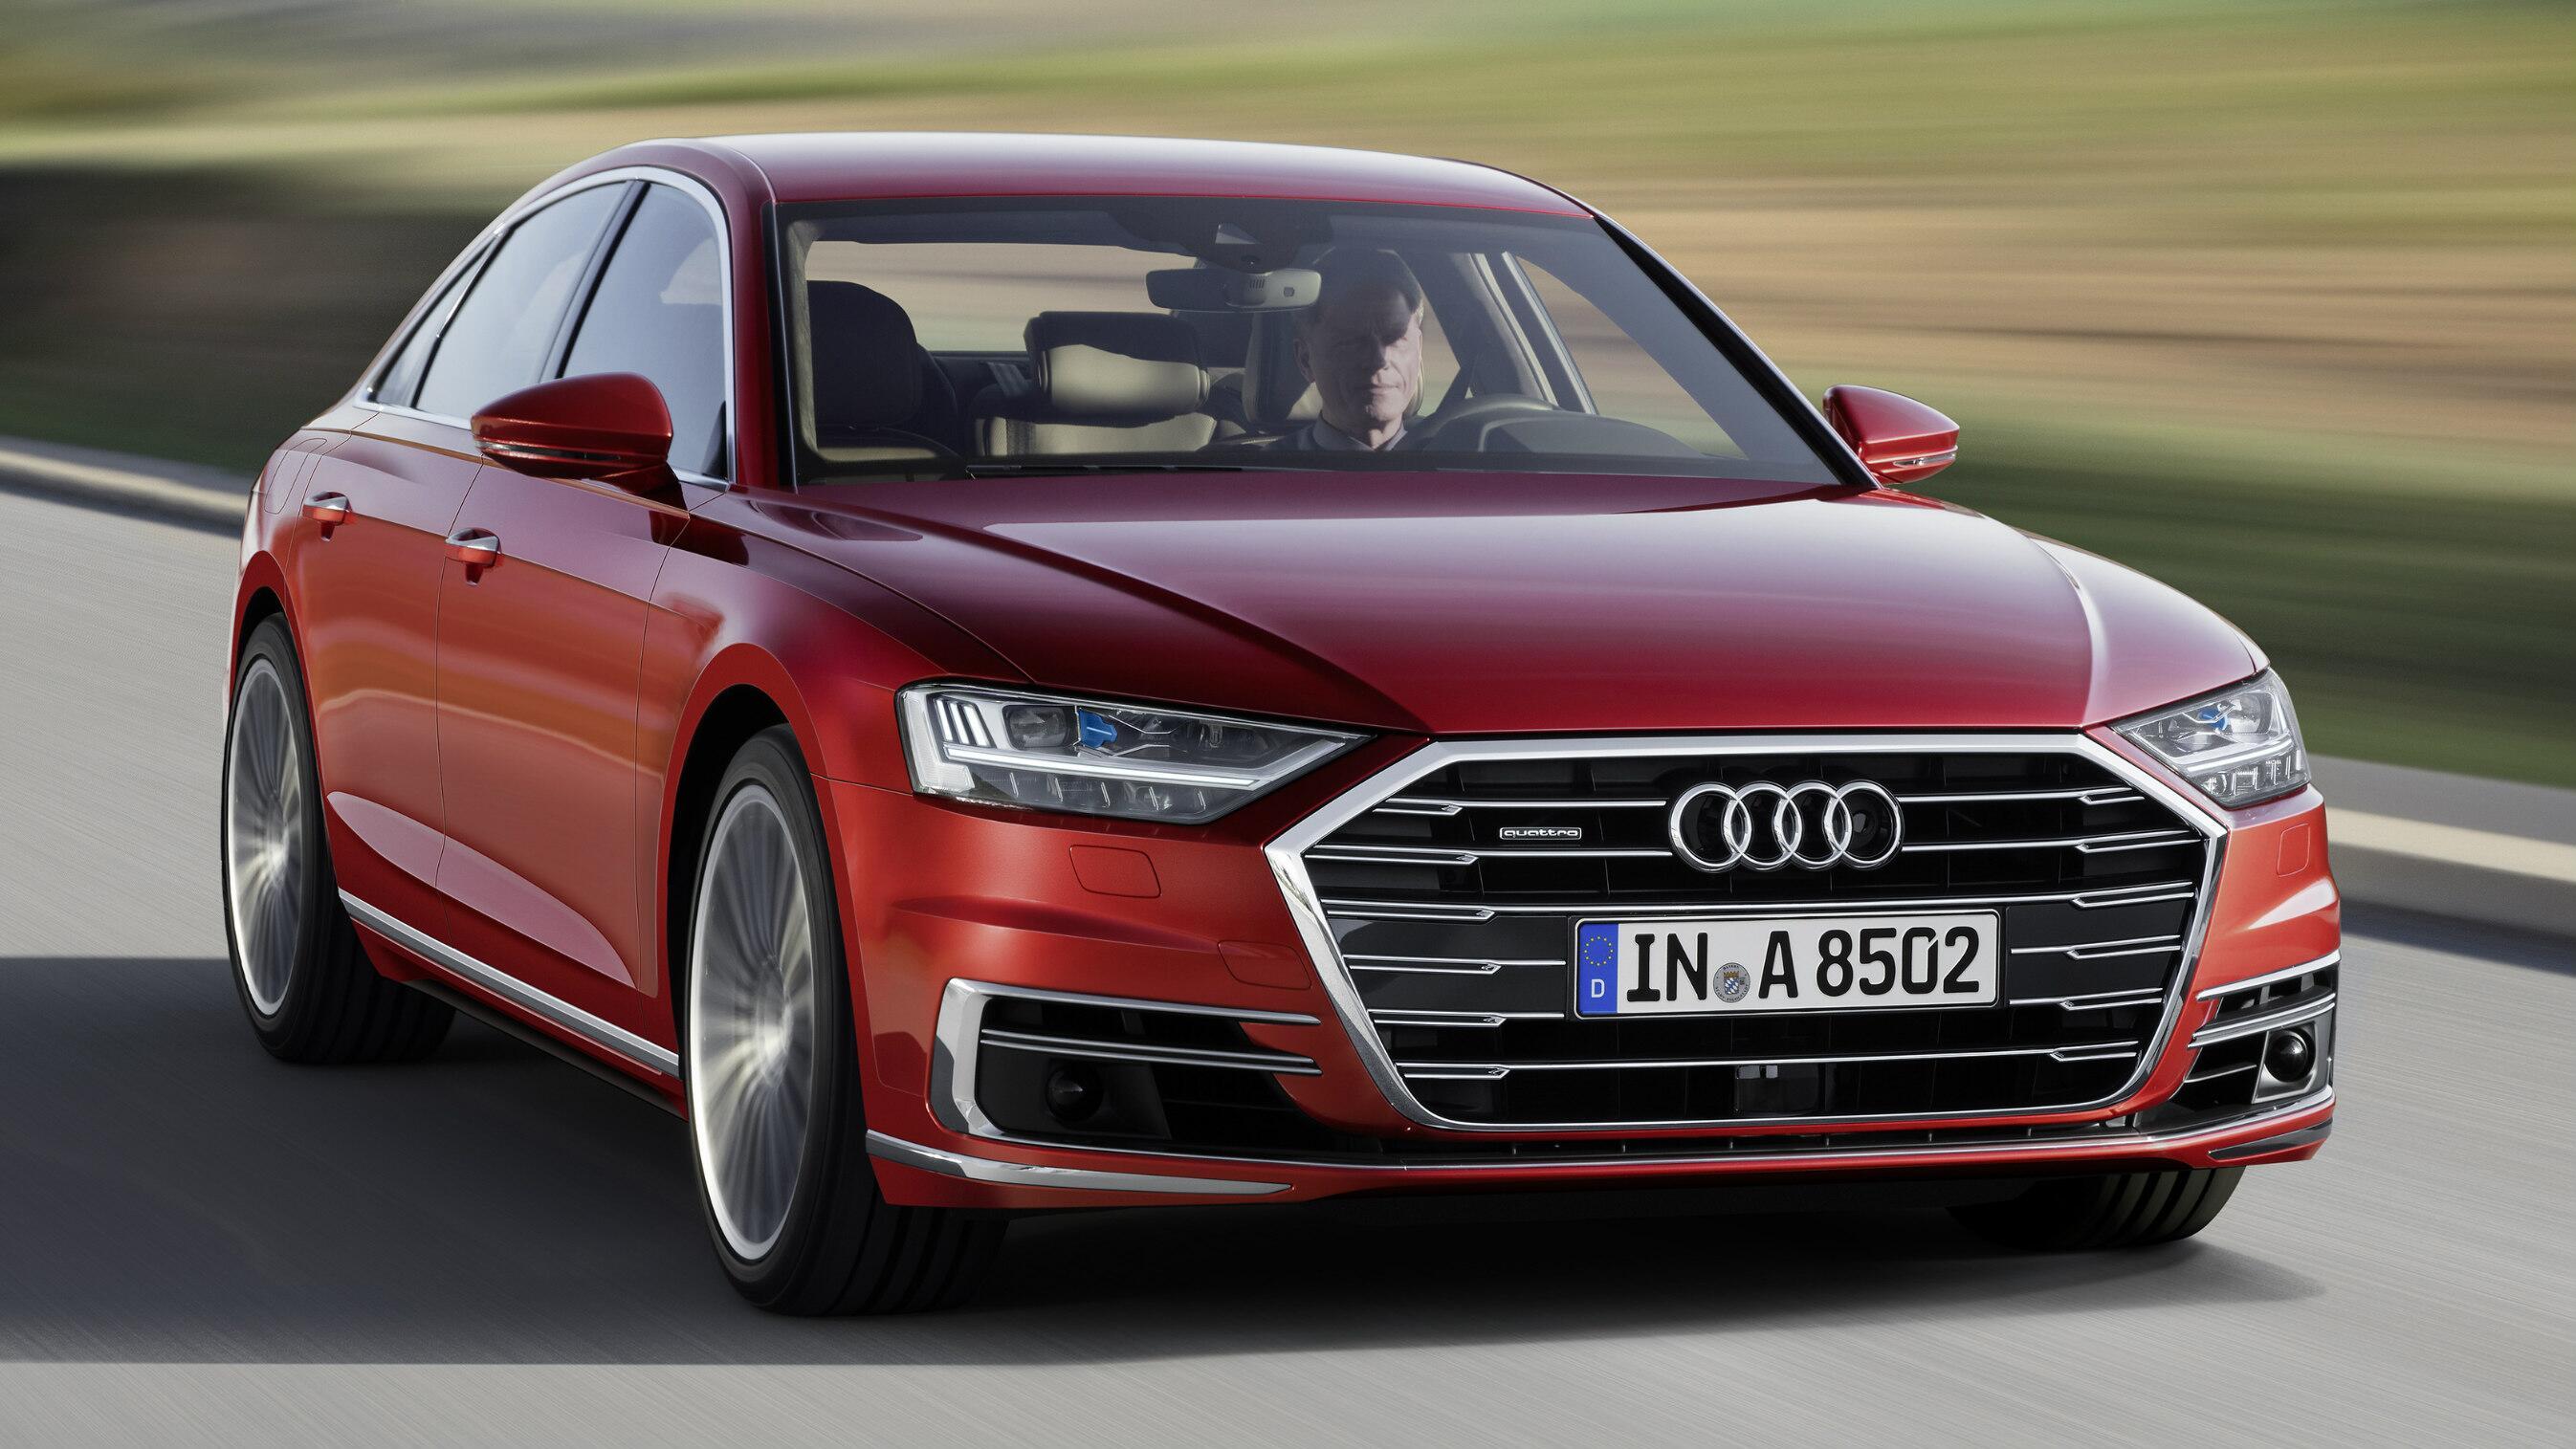 Unveiled New Audi A8 Car News Bbc Topgear Magazine India